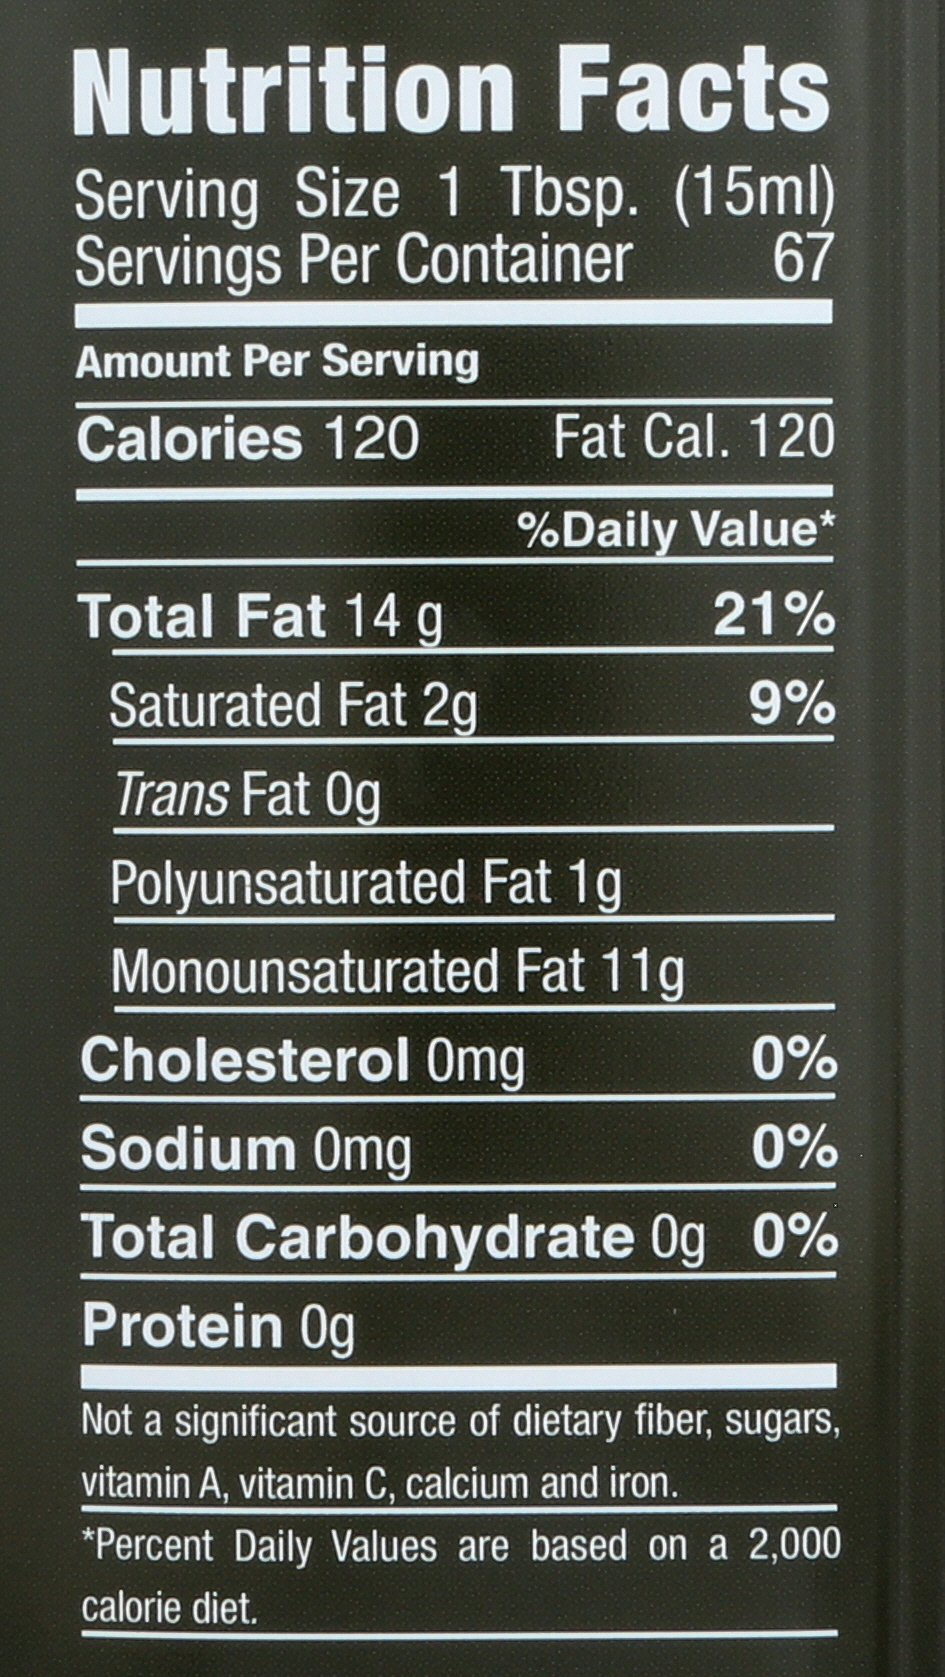 Colavita Extra Virgin Olive Oil, 34 oz Tins (Pack of 2) by Colavita (Image #2)